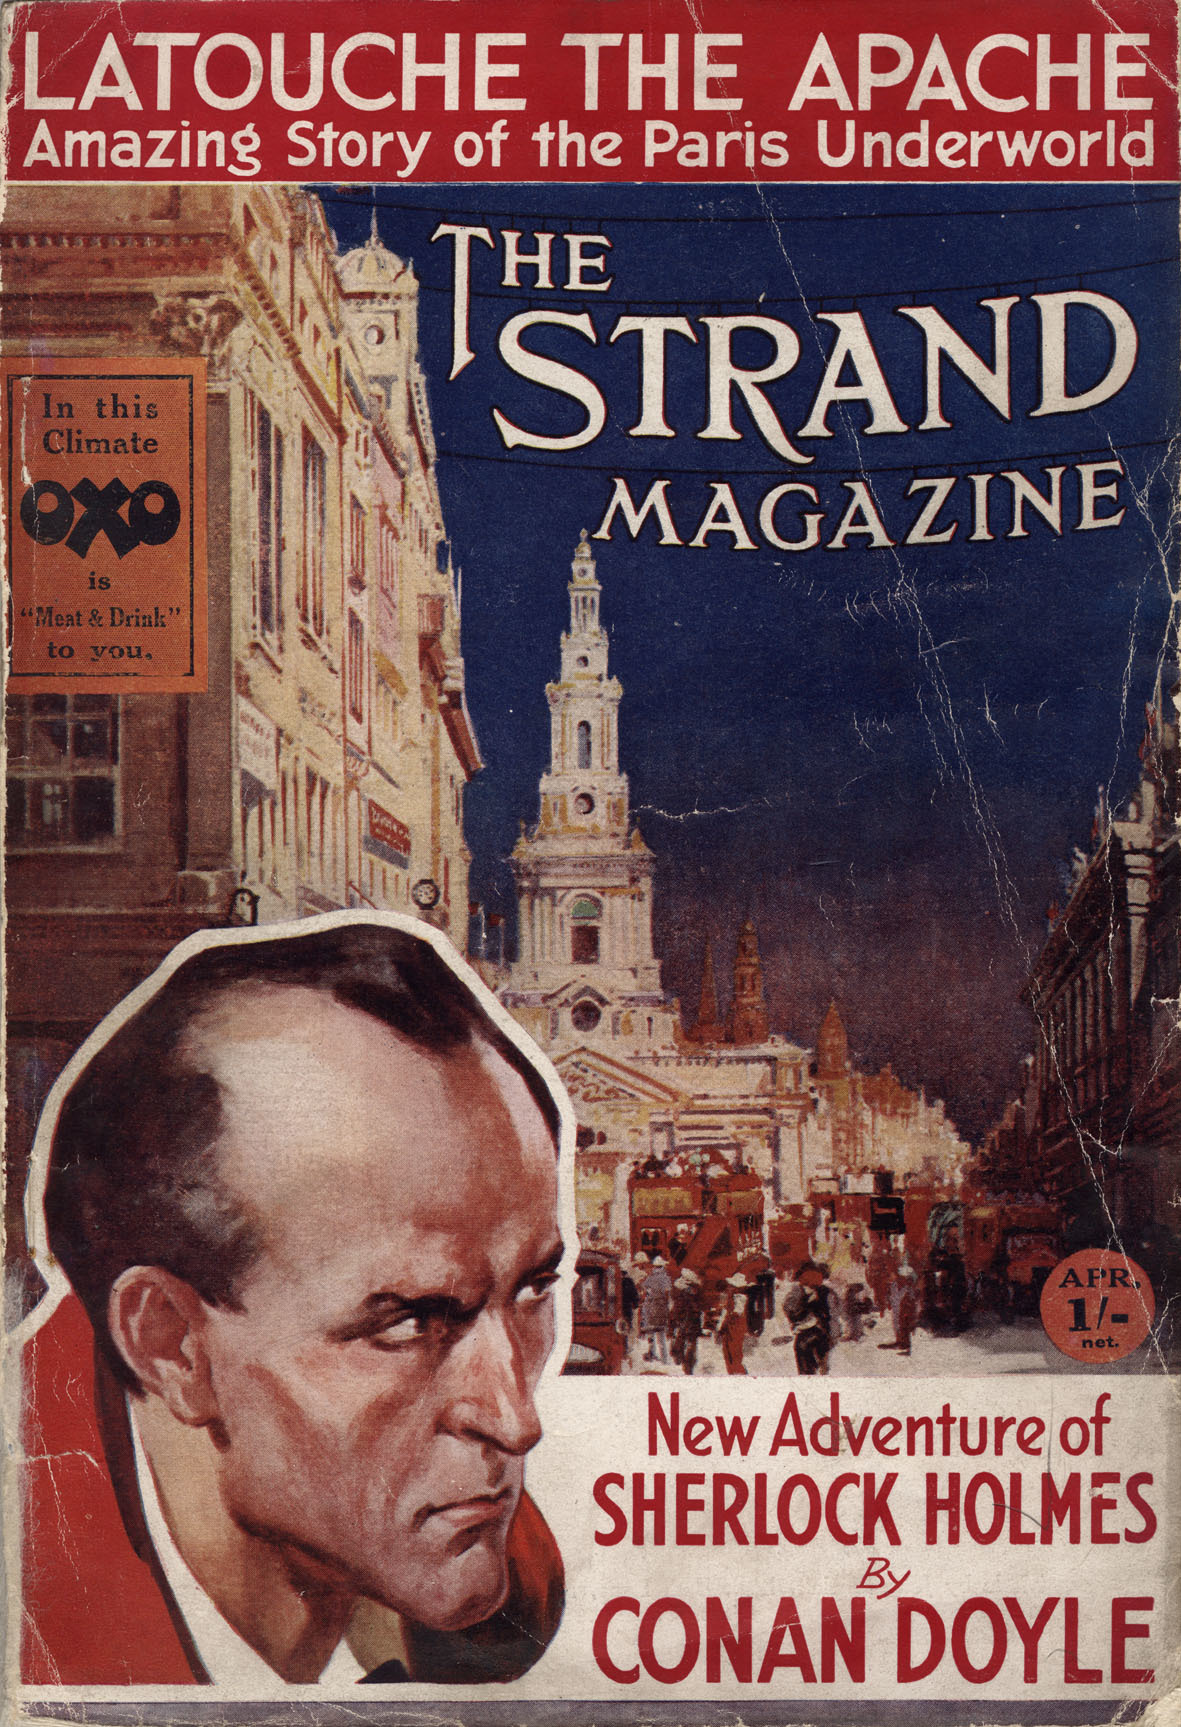 Sherlock Holmes in the Strand Magazine